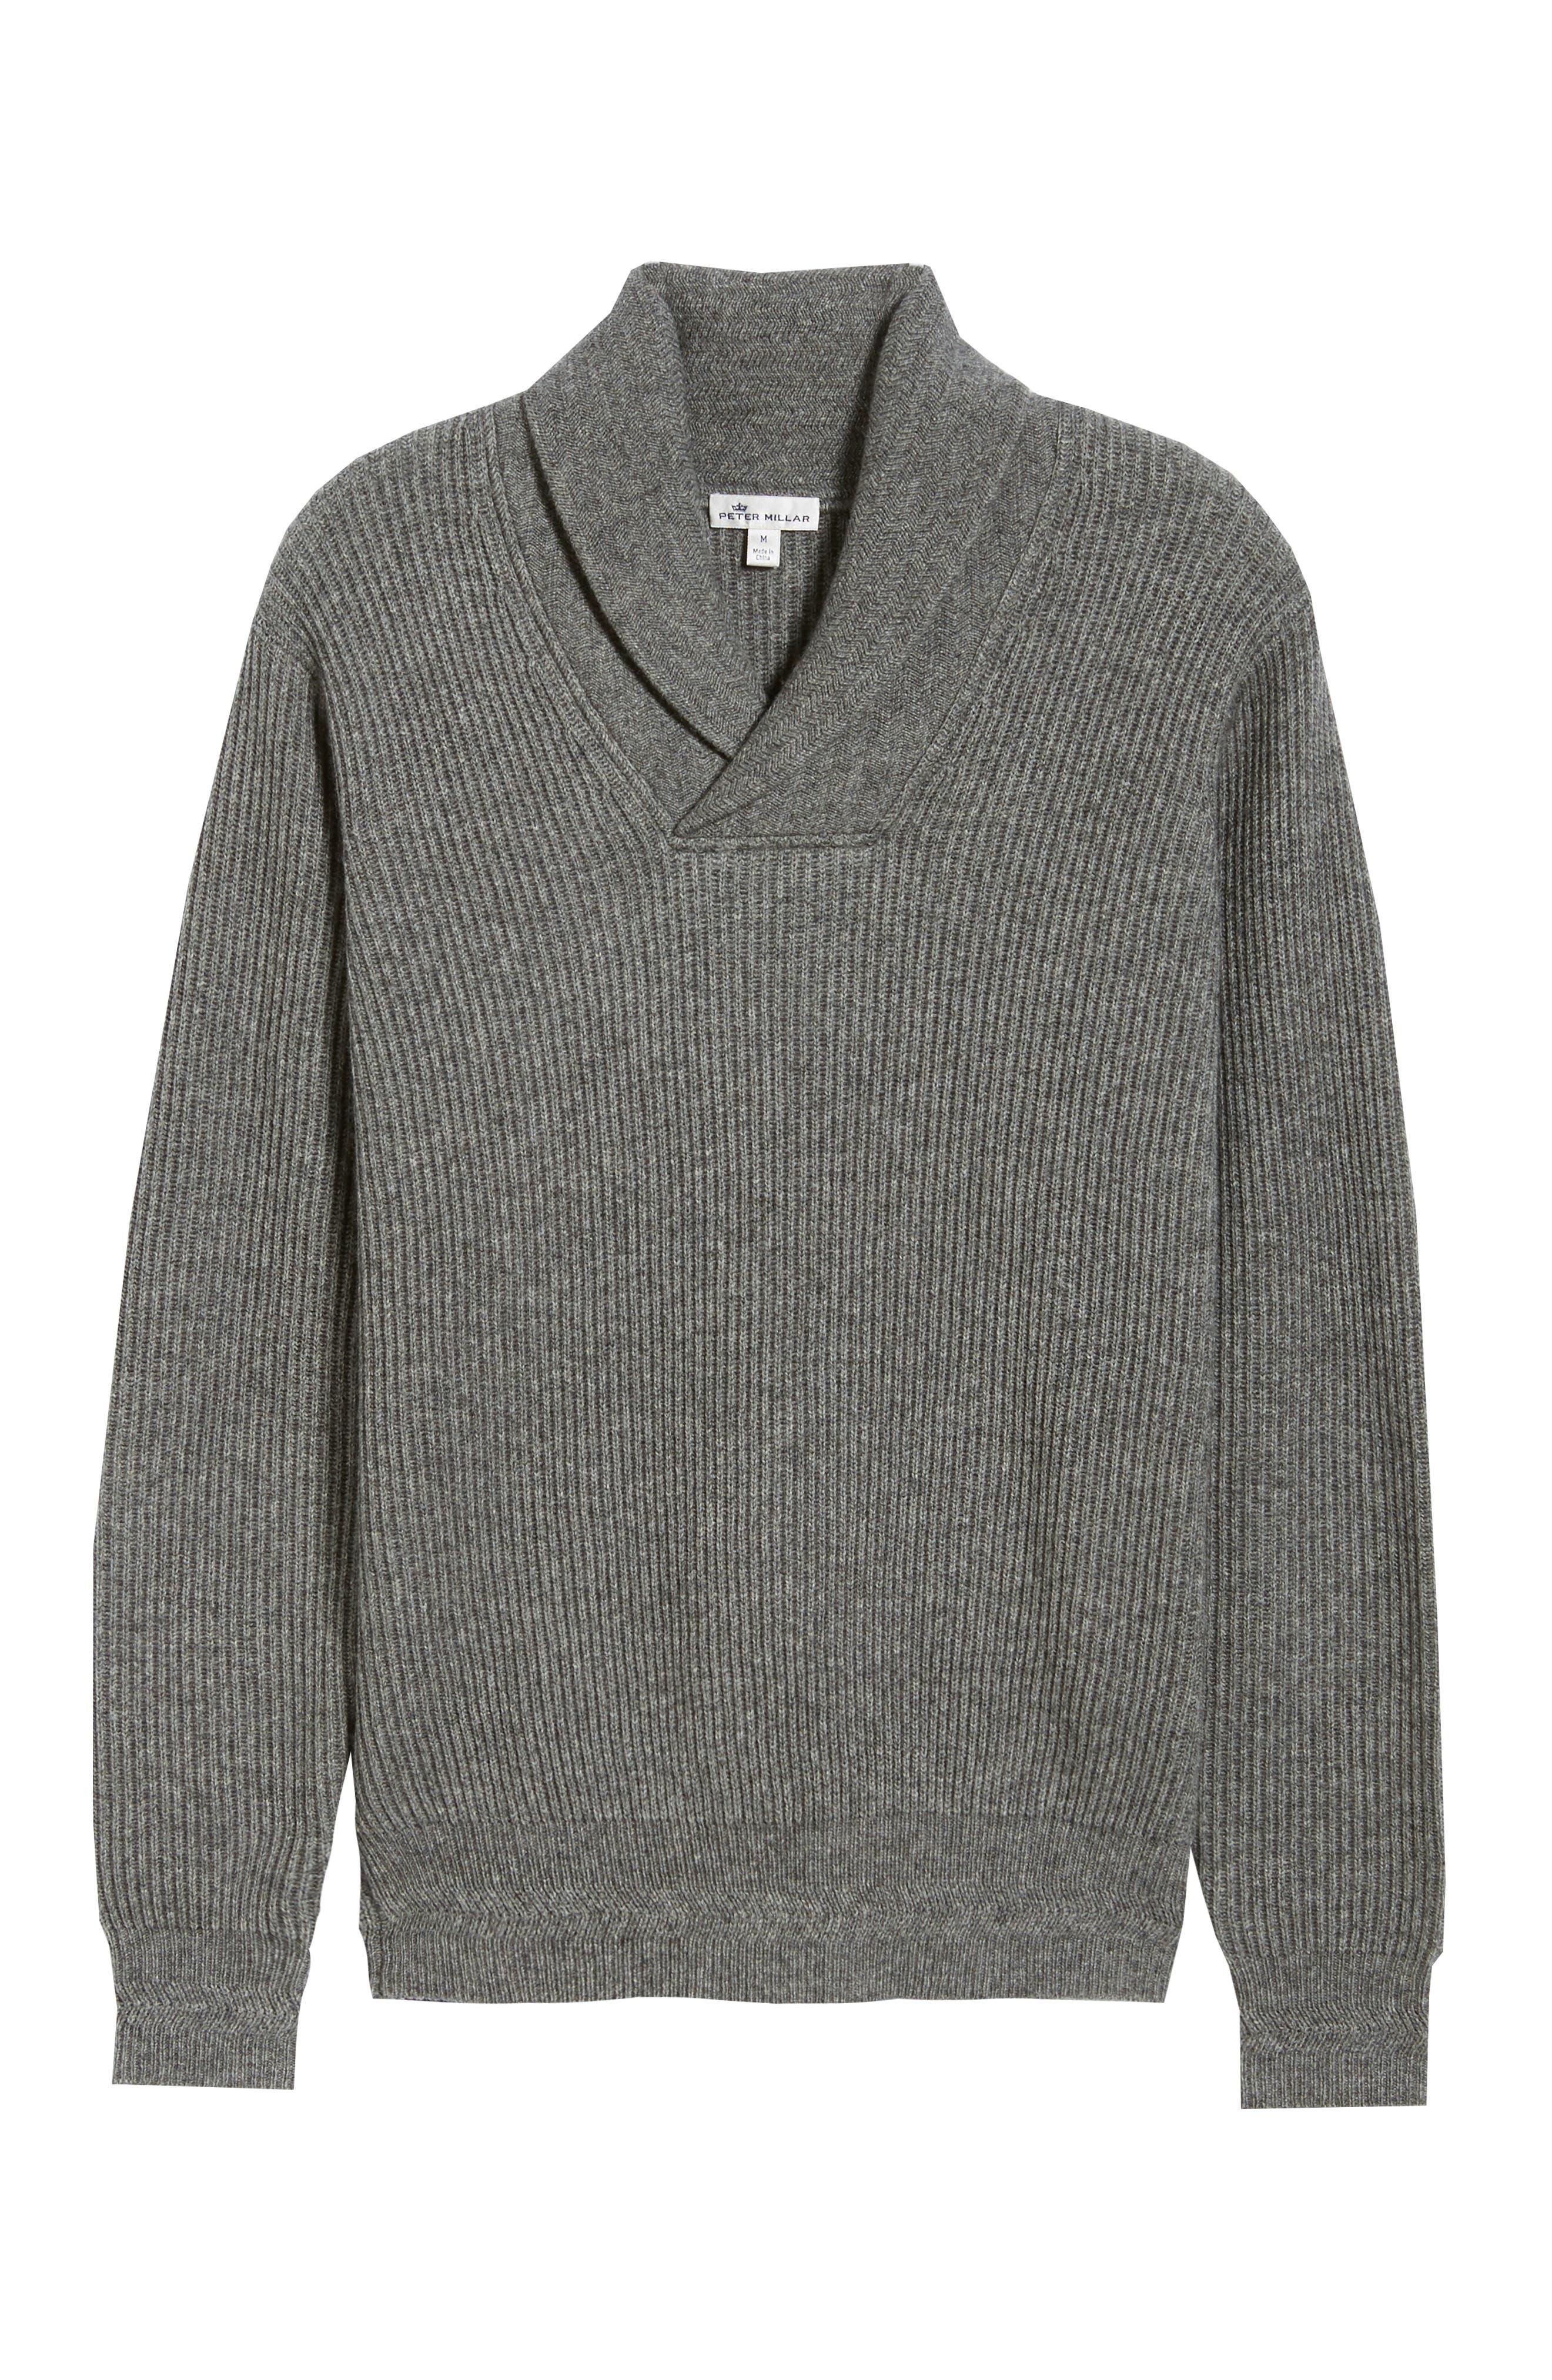 Mountainside Wool Blend Shawl Sweater,                             Alternate thumbnail 6, color,                             GREY